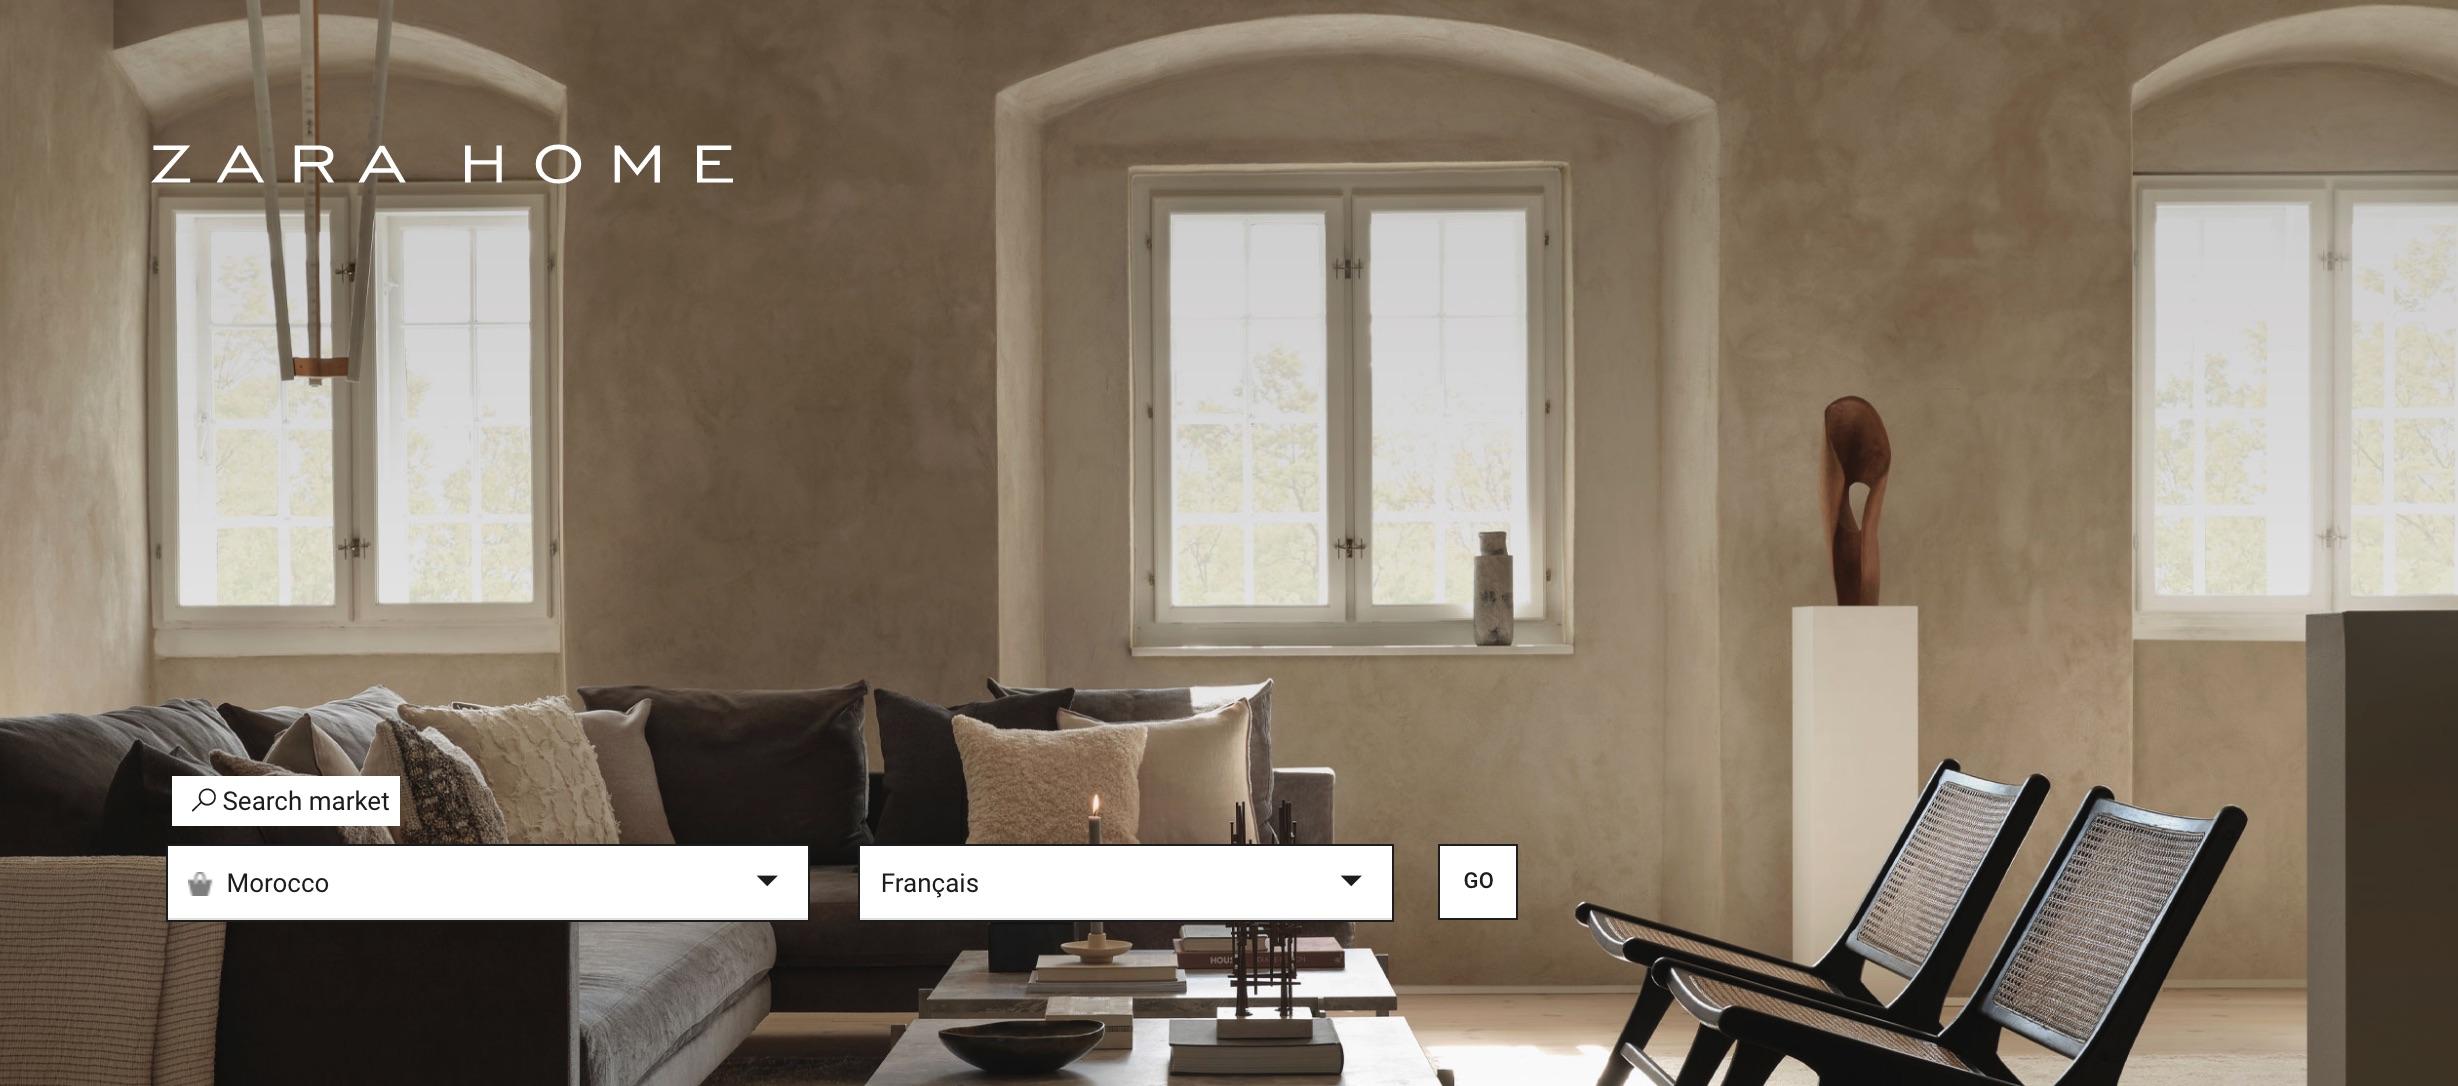 Shopping: Ventes Zara Home on line